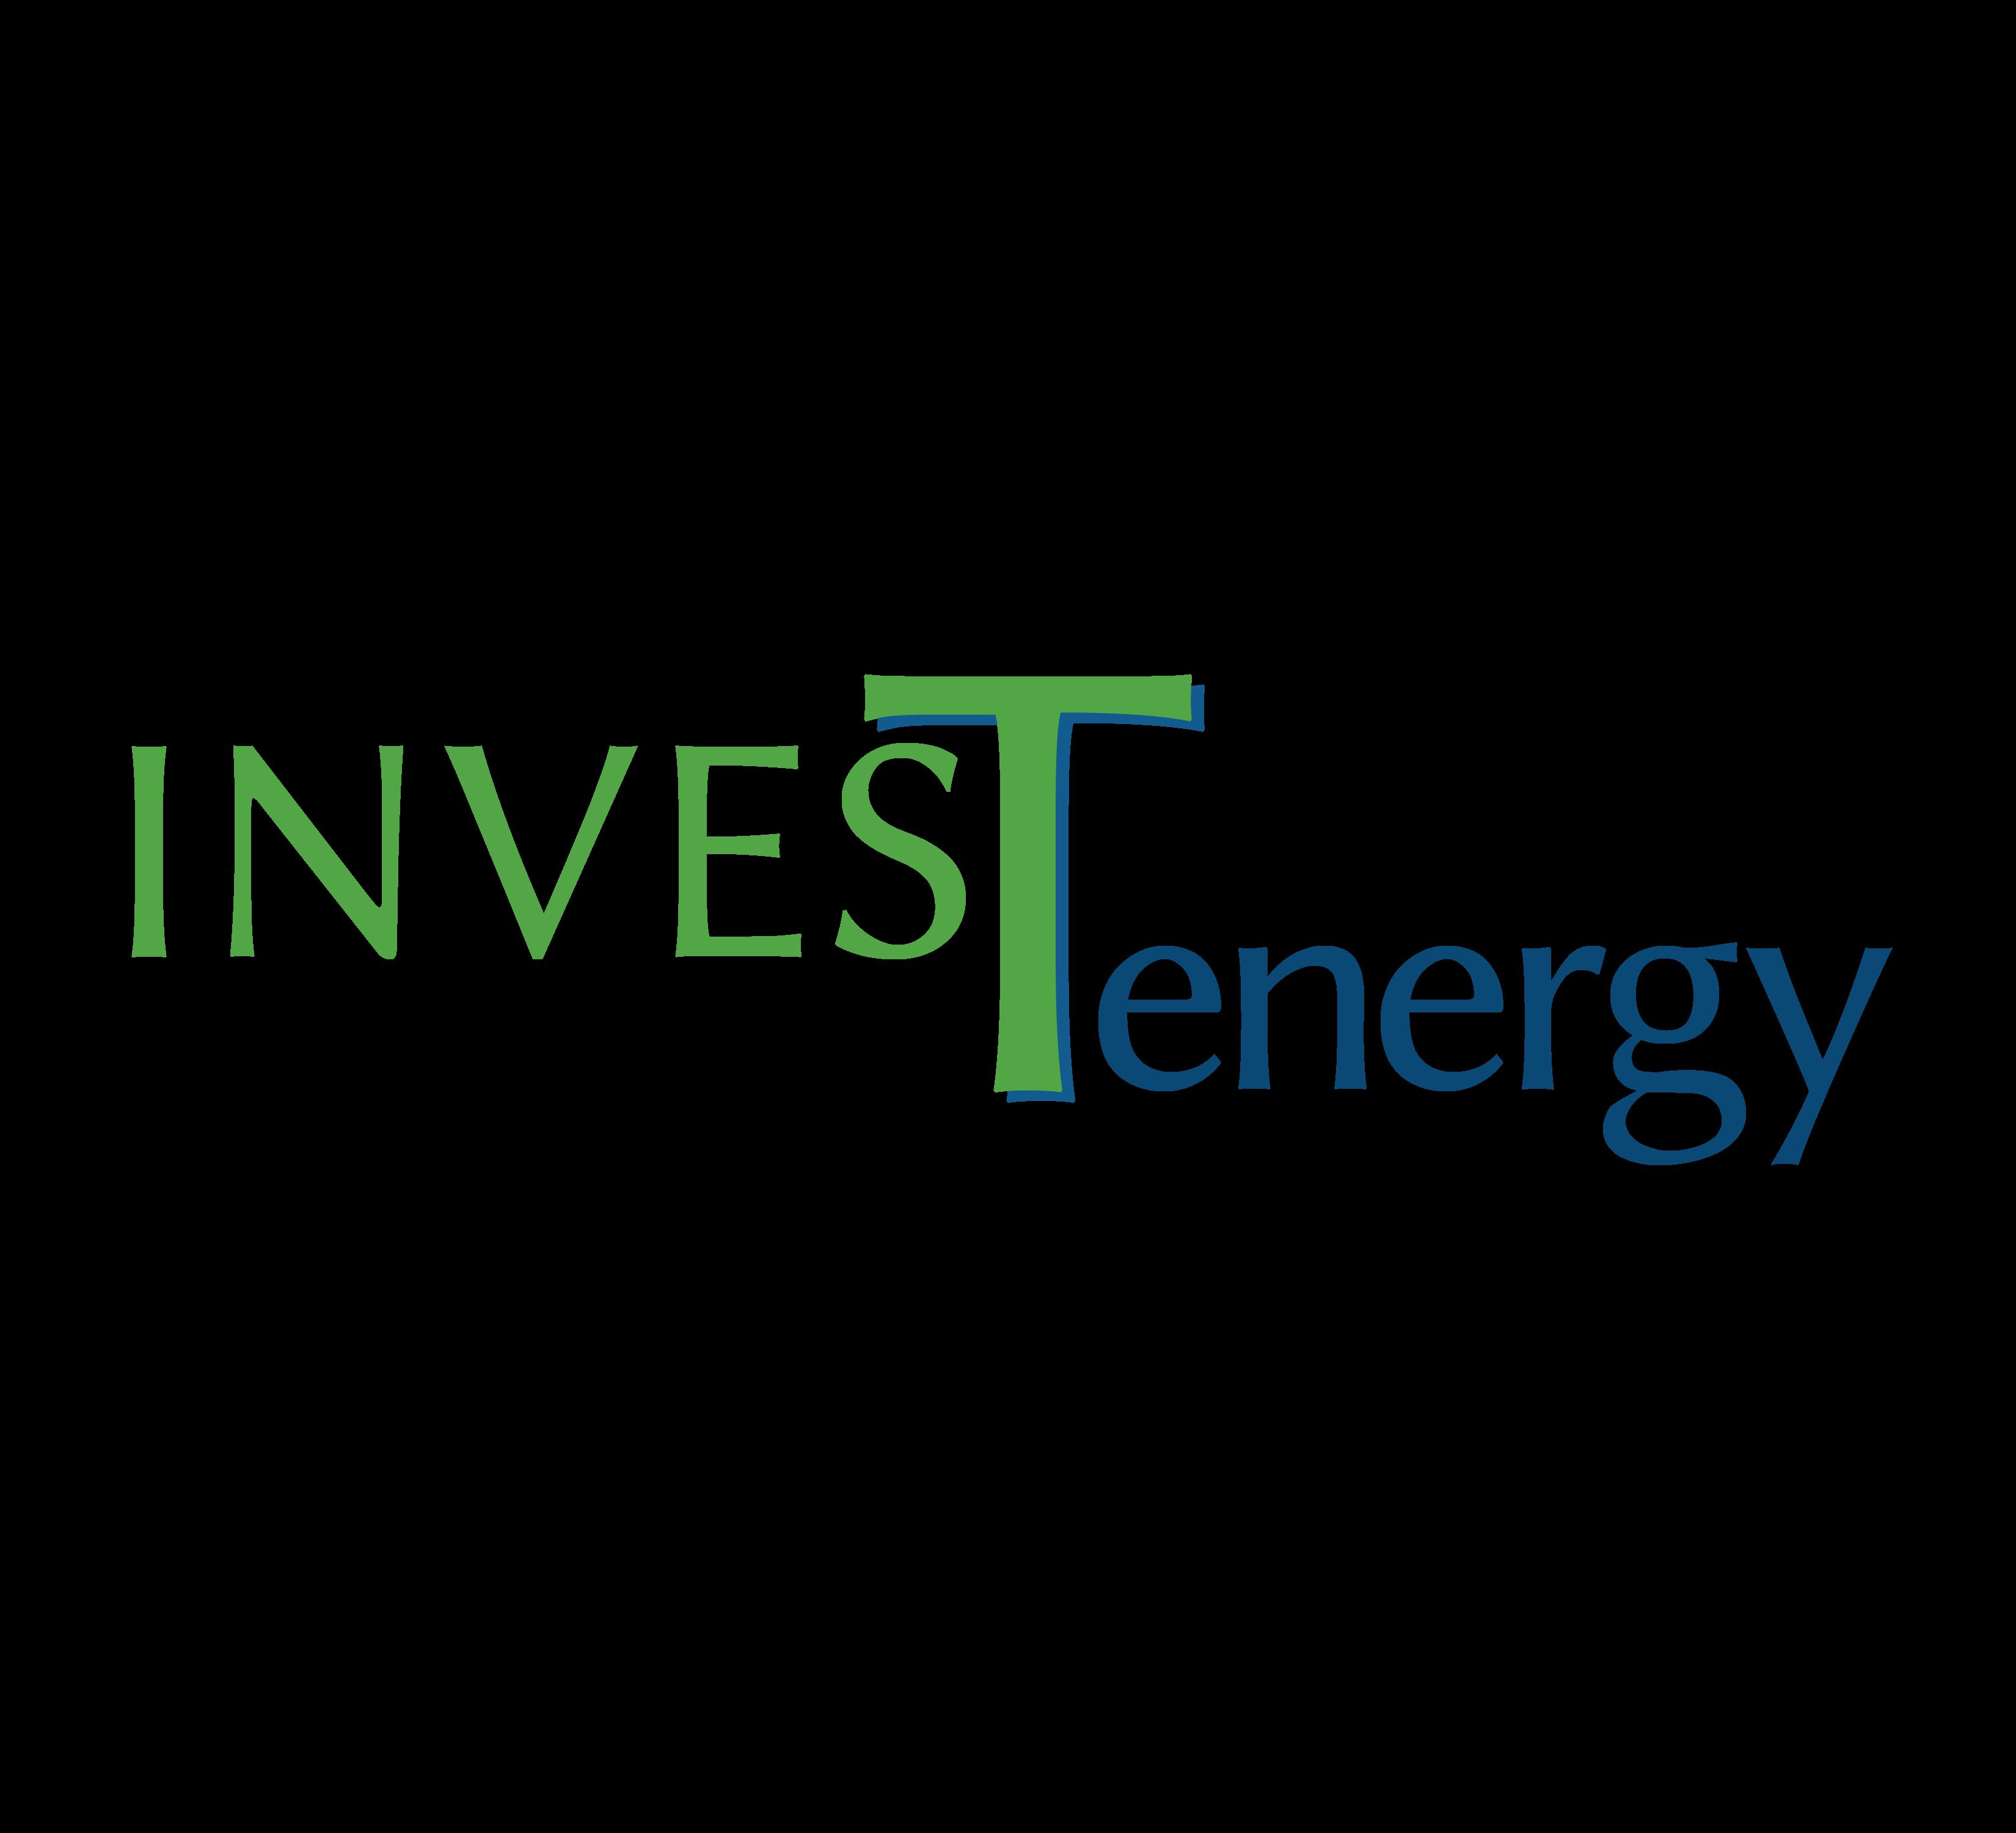 Invest Energy